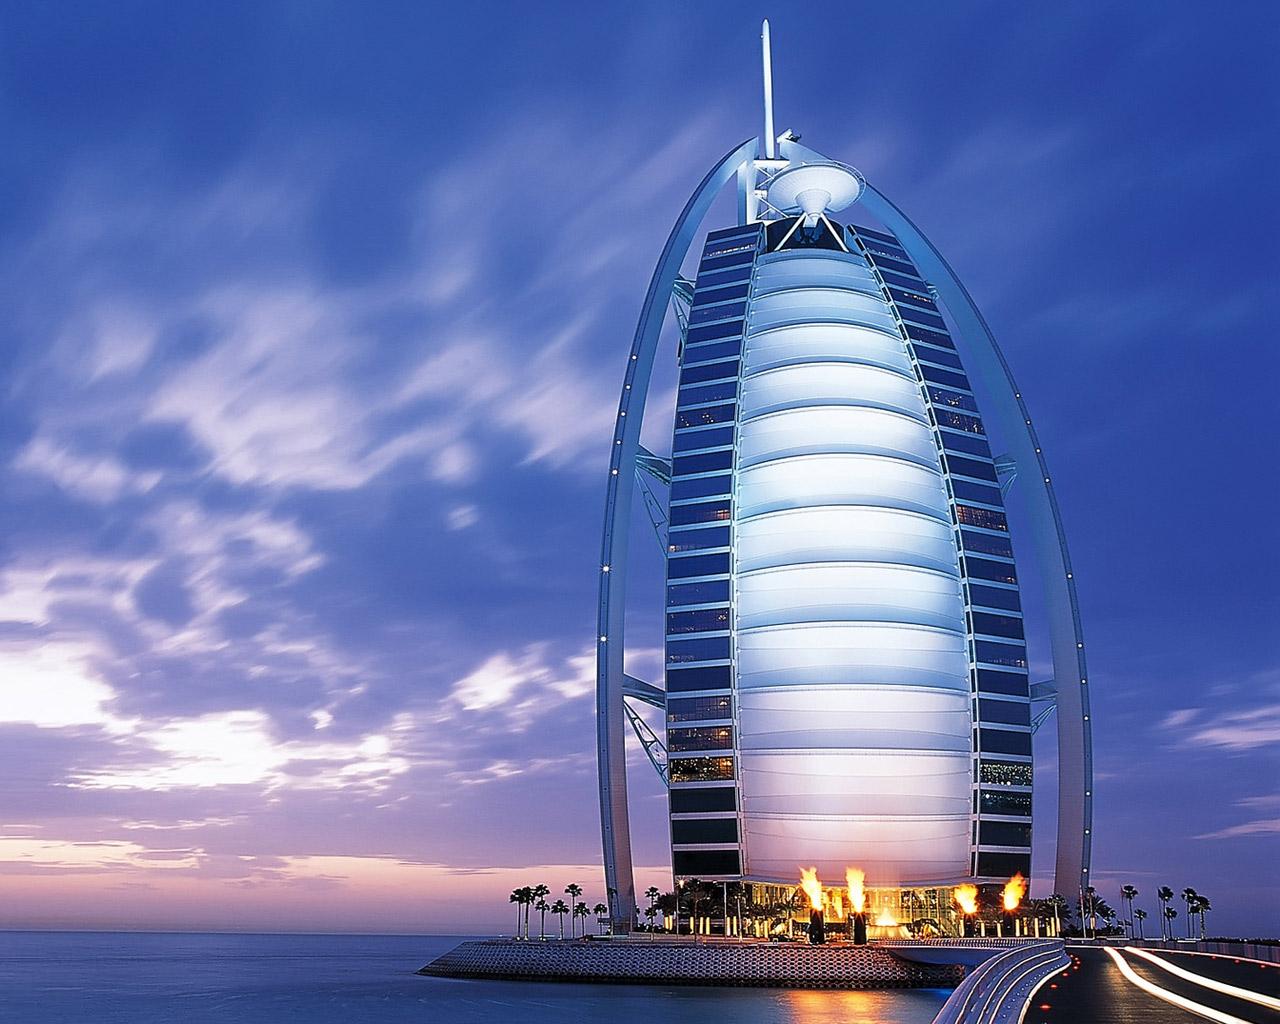 Dubai UAE backgrounds wallpaper High Quality WallpapersWallpaper 1280x1024